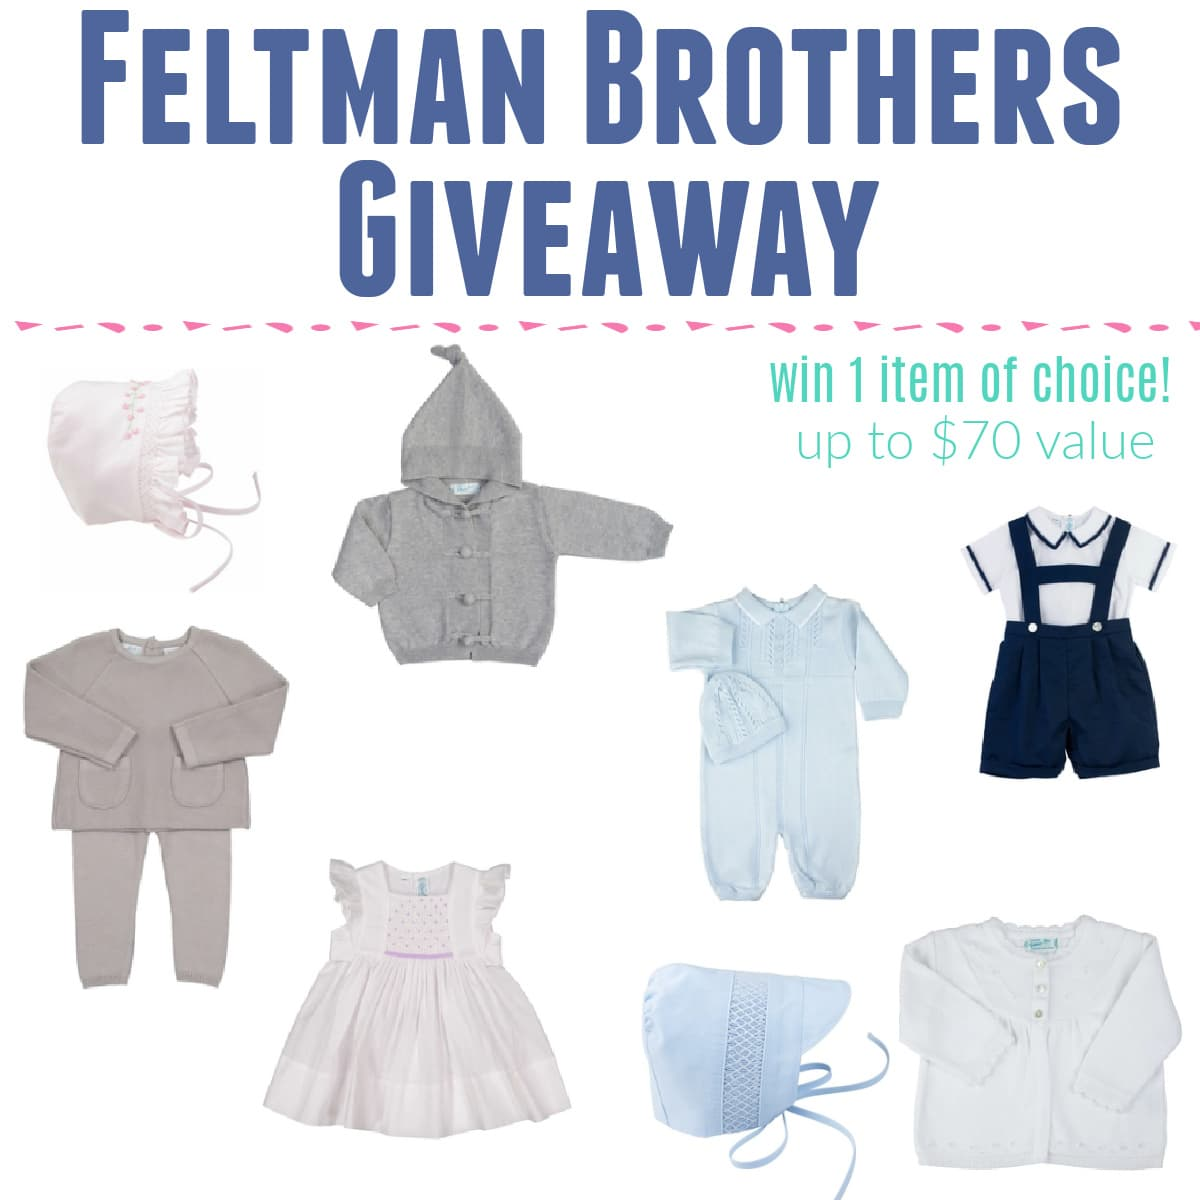 Feltman Brothers Heirloom Clothing Giveaway